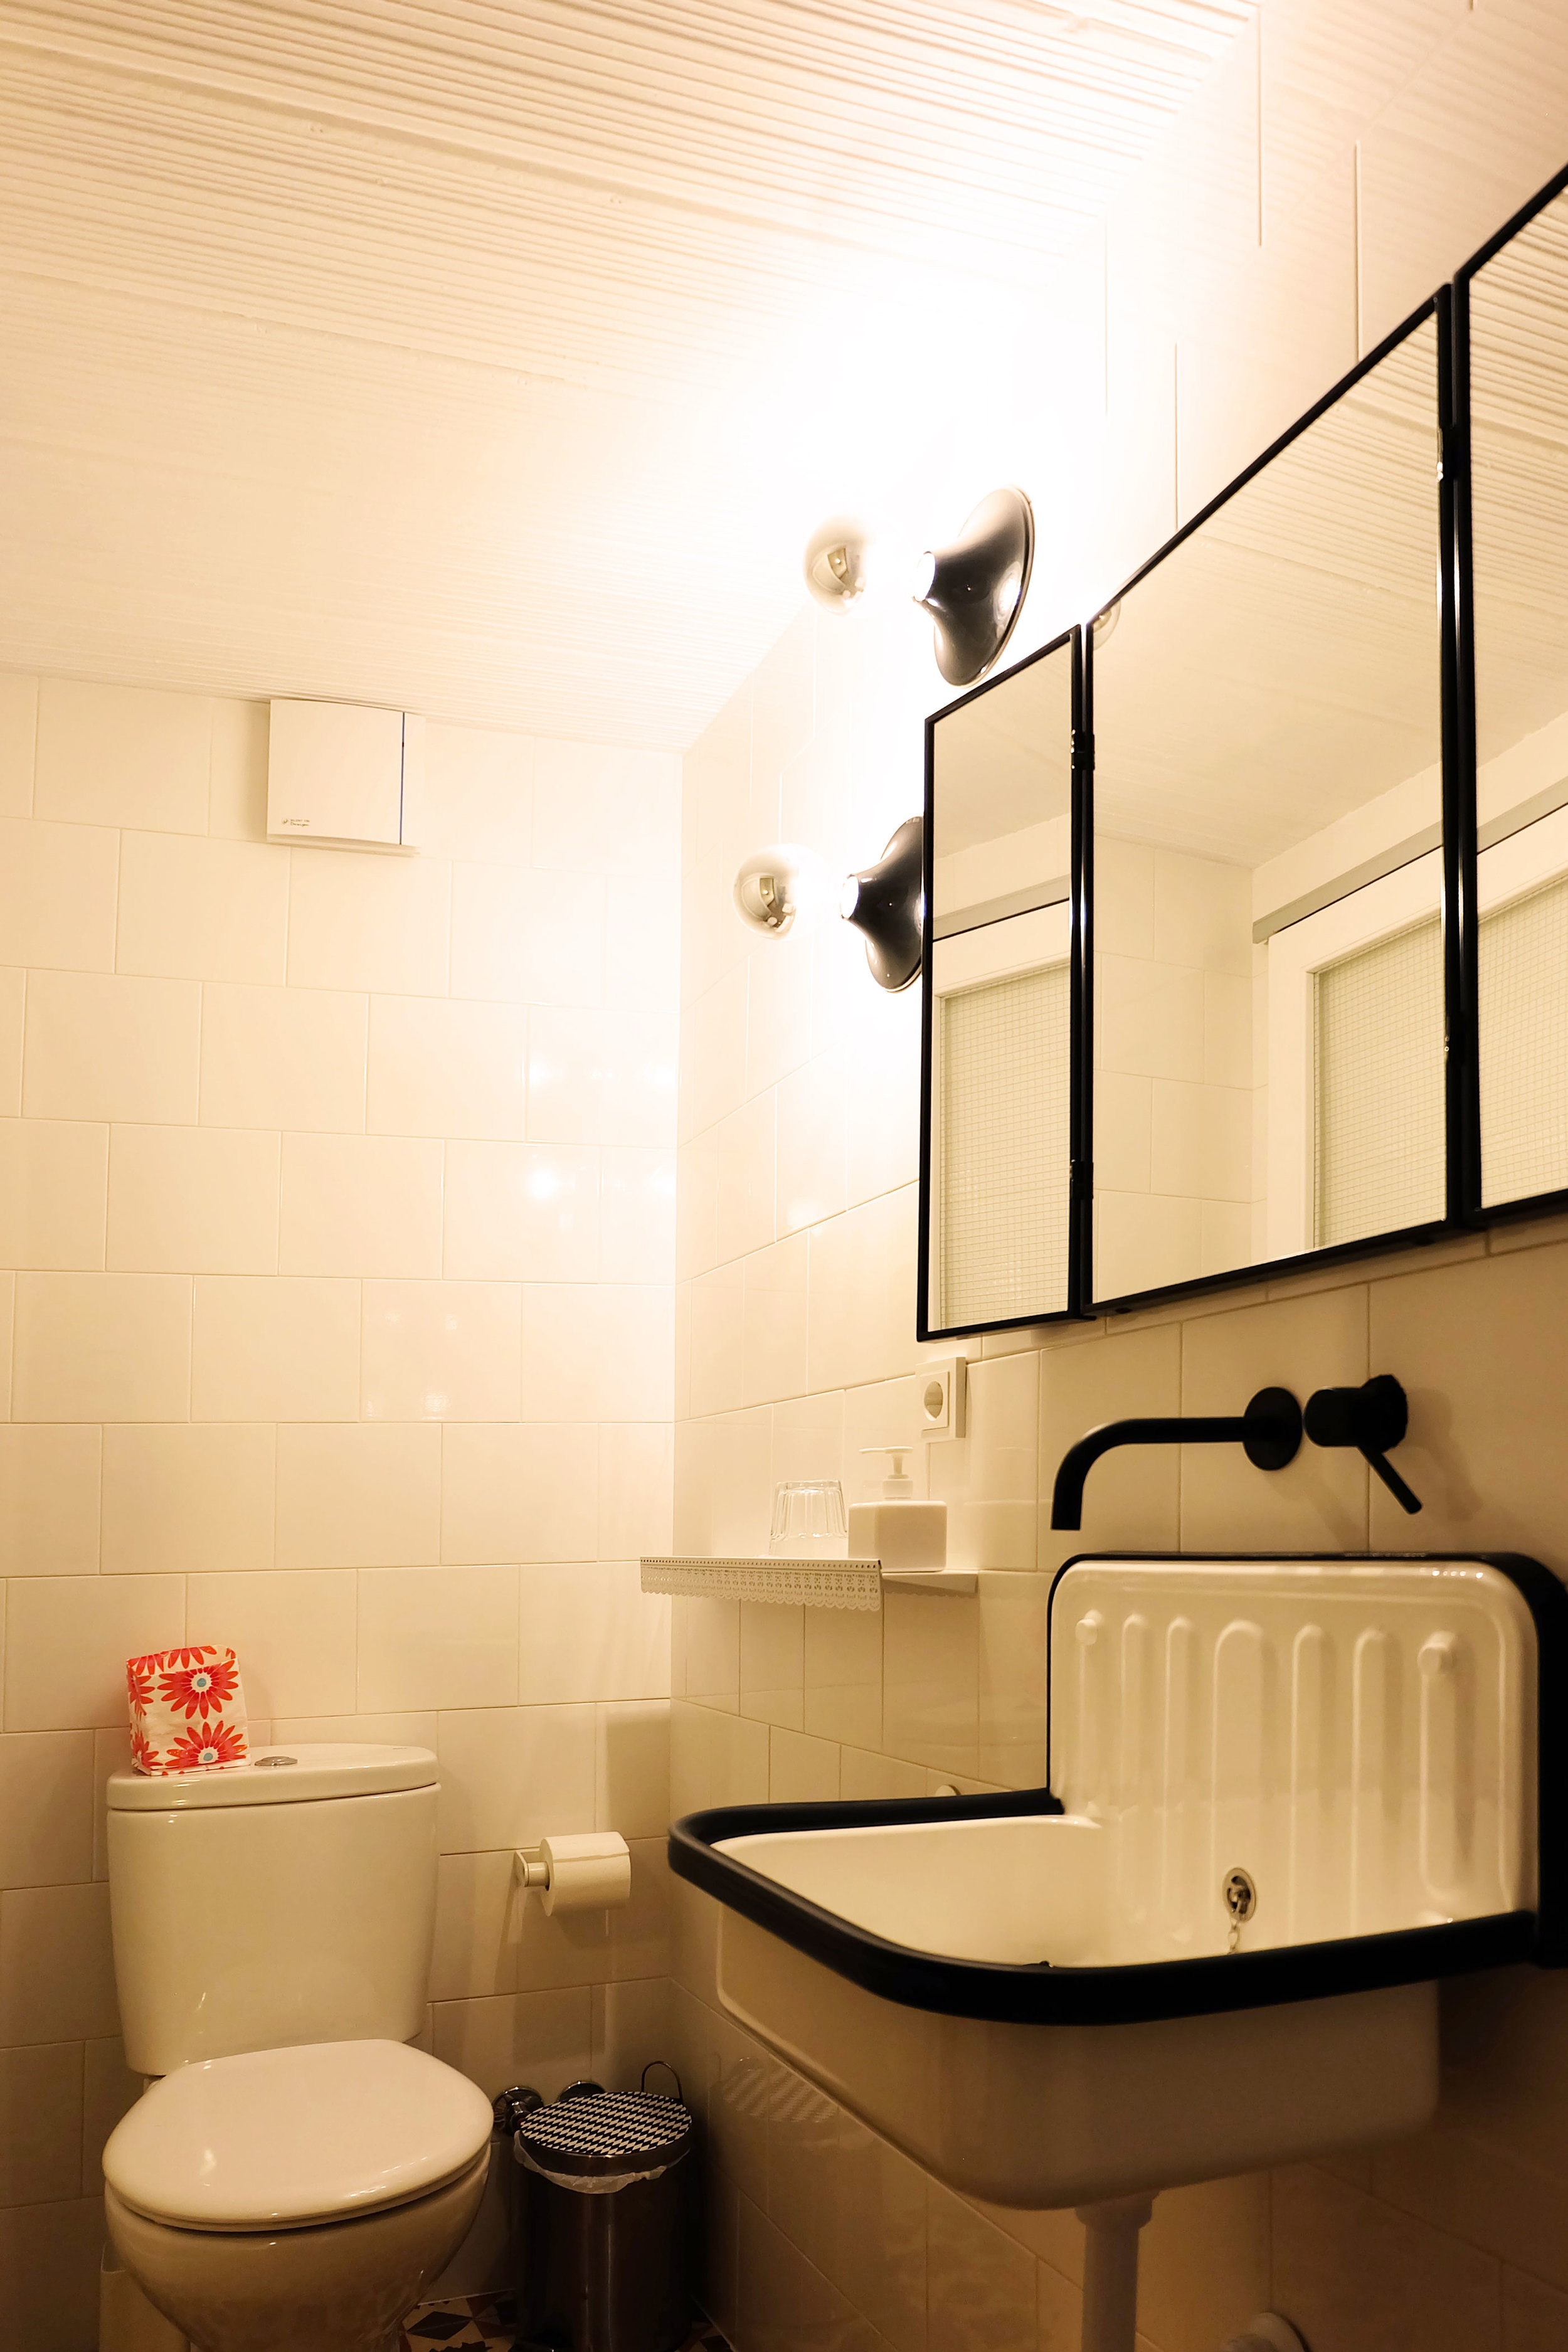 Hotel-Casa-de-Huespedes-Santa-Maria-Habitacion-10-12.jpg